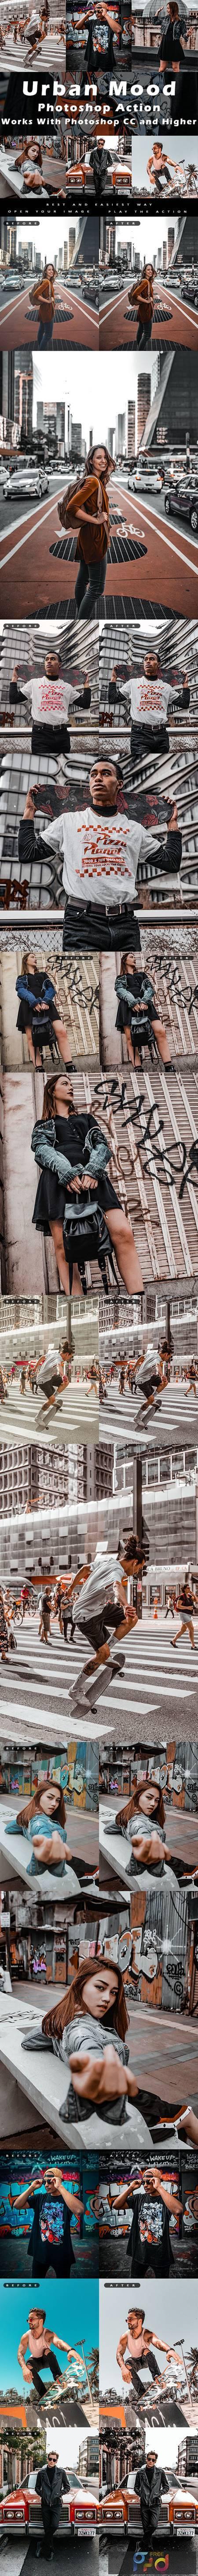 Urban Mood - Photoshop Action 29183095 1